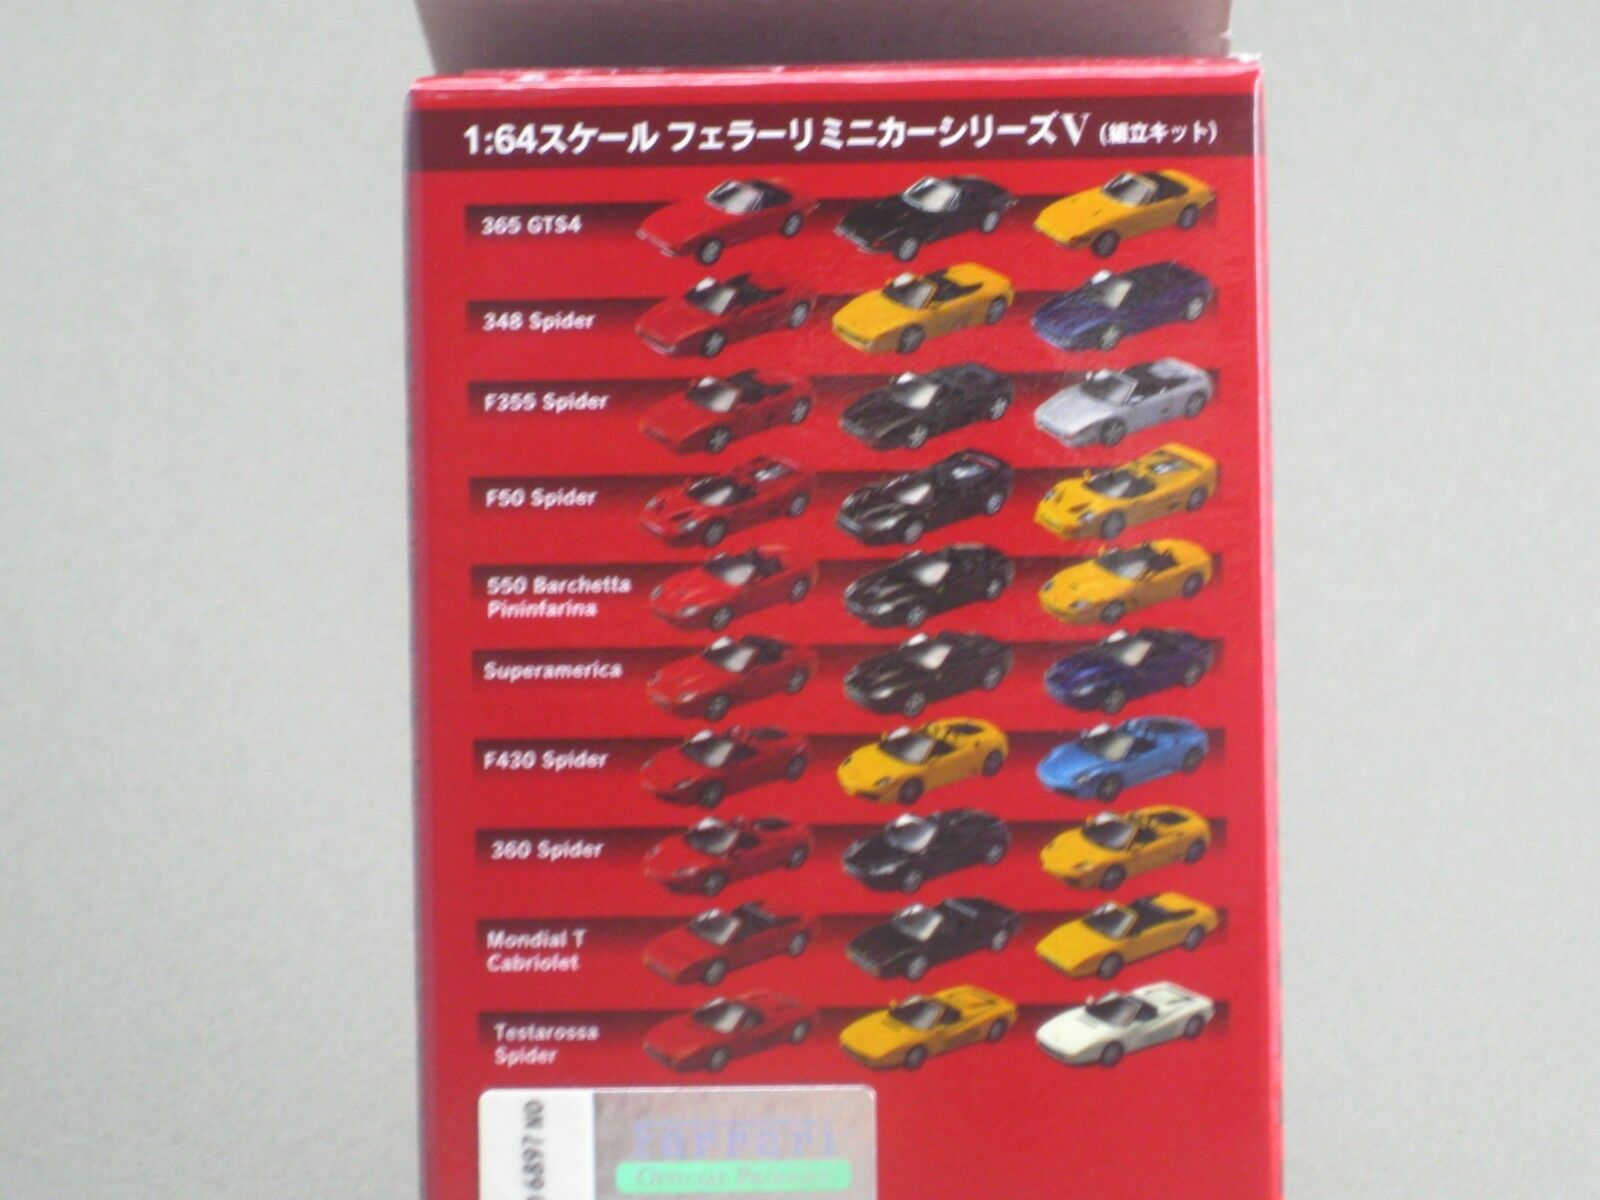 Ferrari 348 Spider Yellow Kyosho 1 64 64 64 Scale Diecast Model Car c9018e